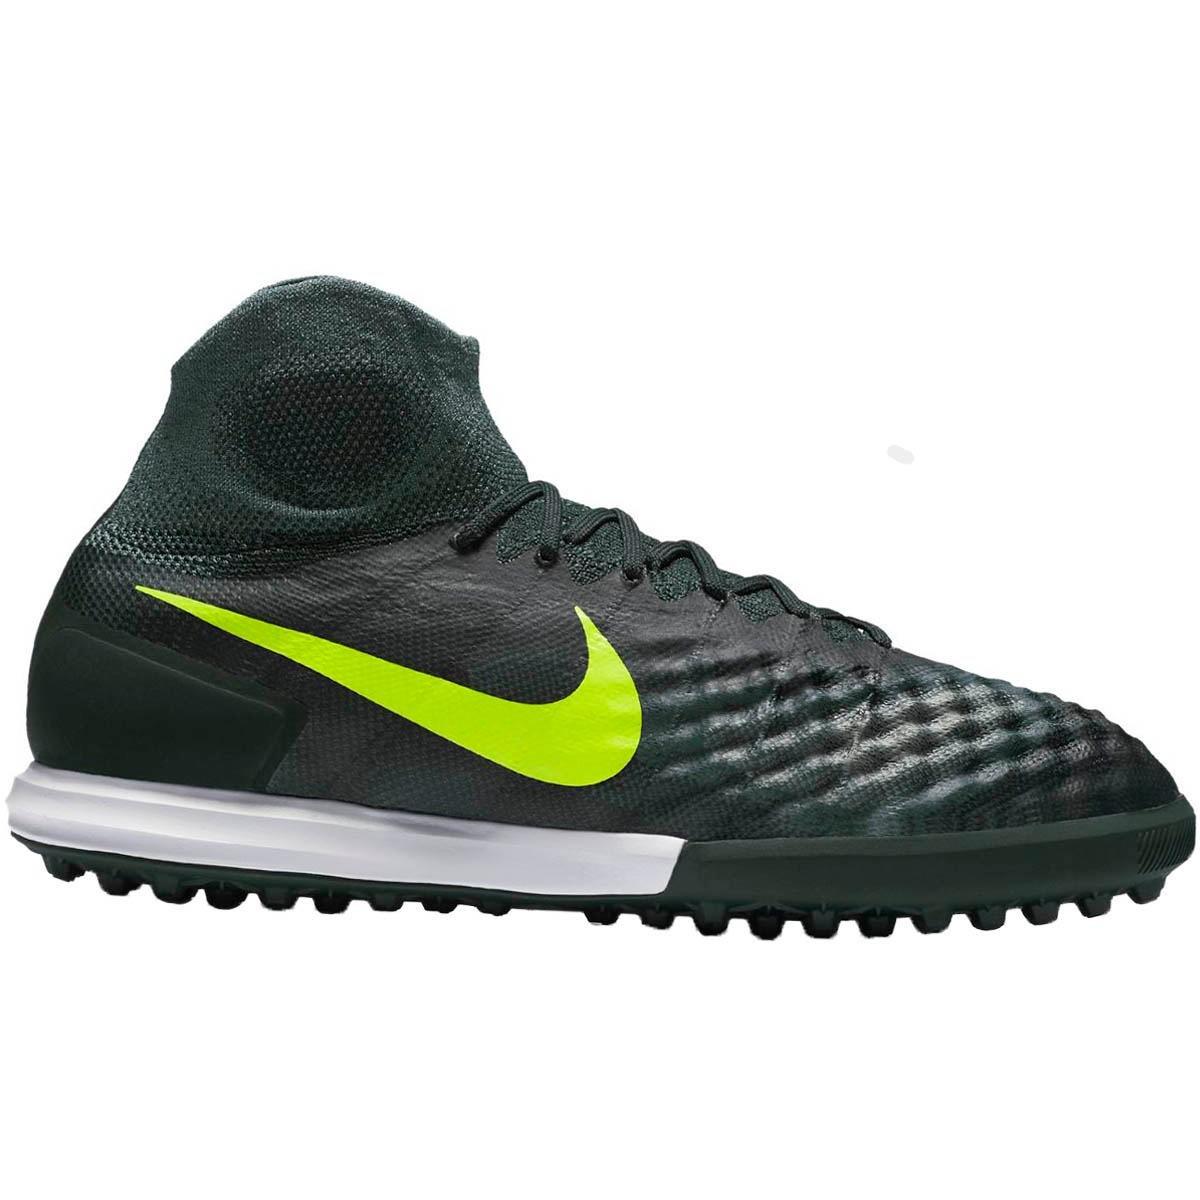 439b5f9b37 Chuteira Society Nike Magistax Proximo II Ultd - Compre Agora